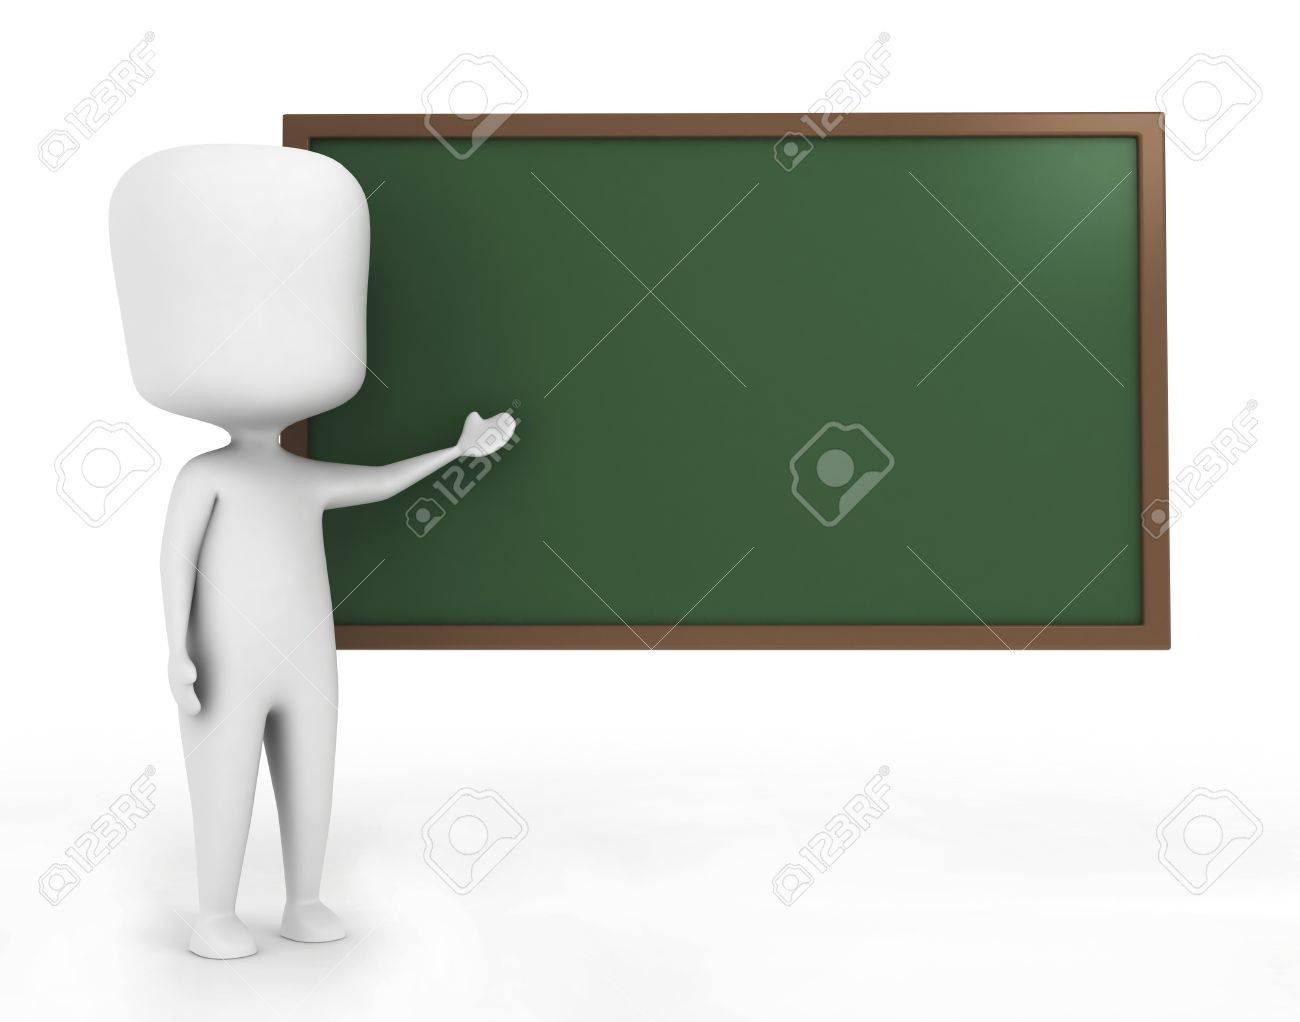 3D Illustration of a Teacher in front of a Blackboard Stock Illustration - 9307216